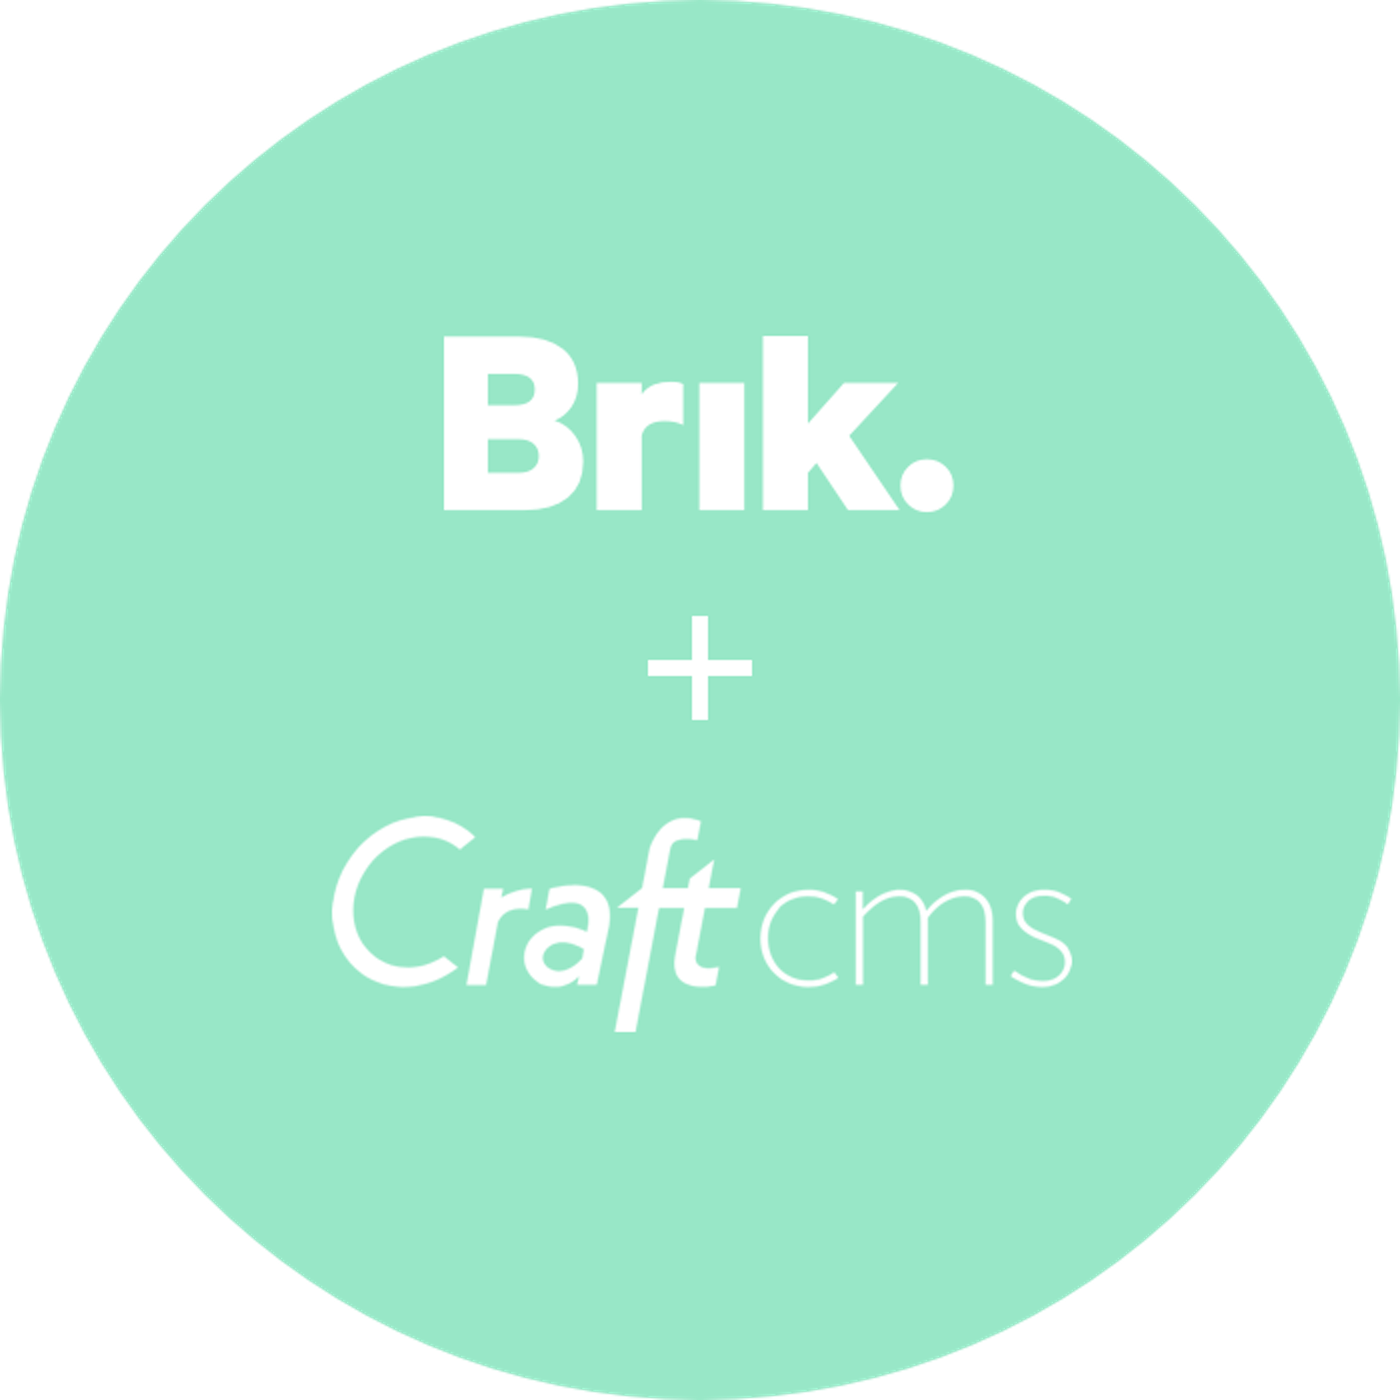 Brik Craft Cms